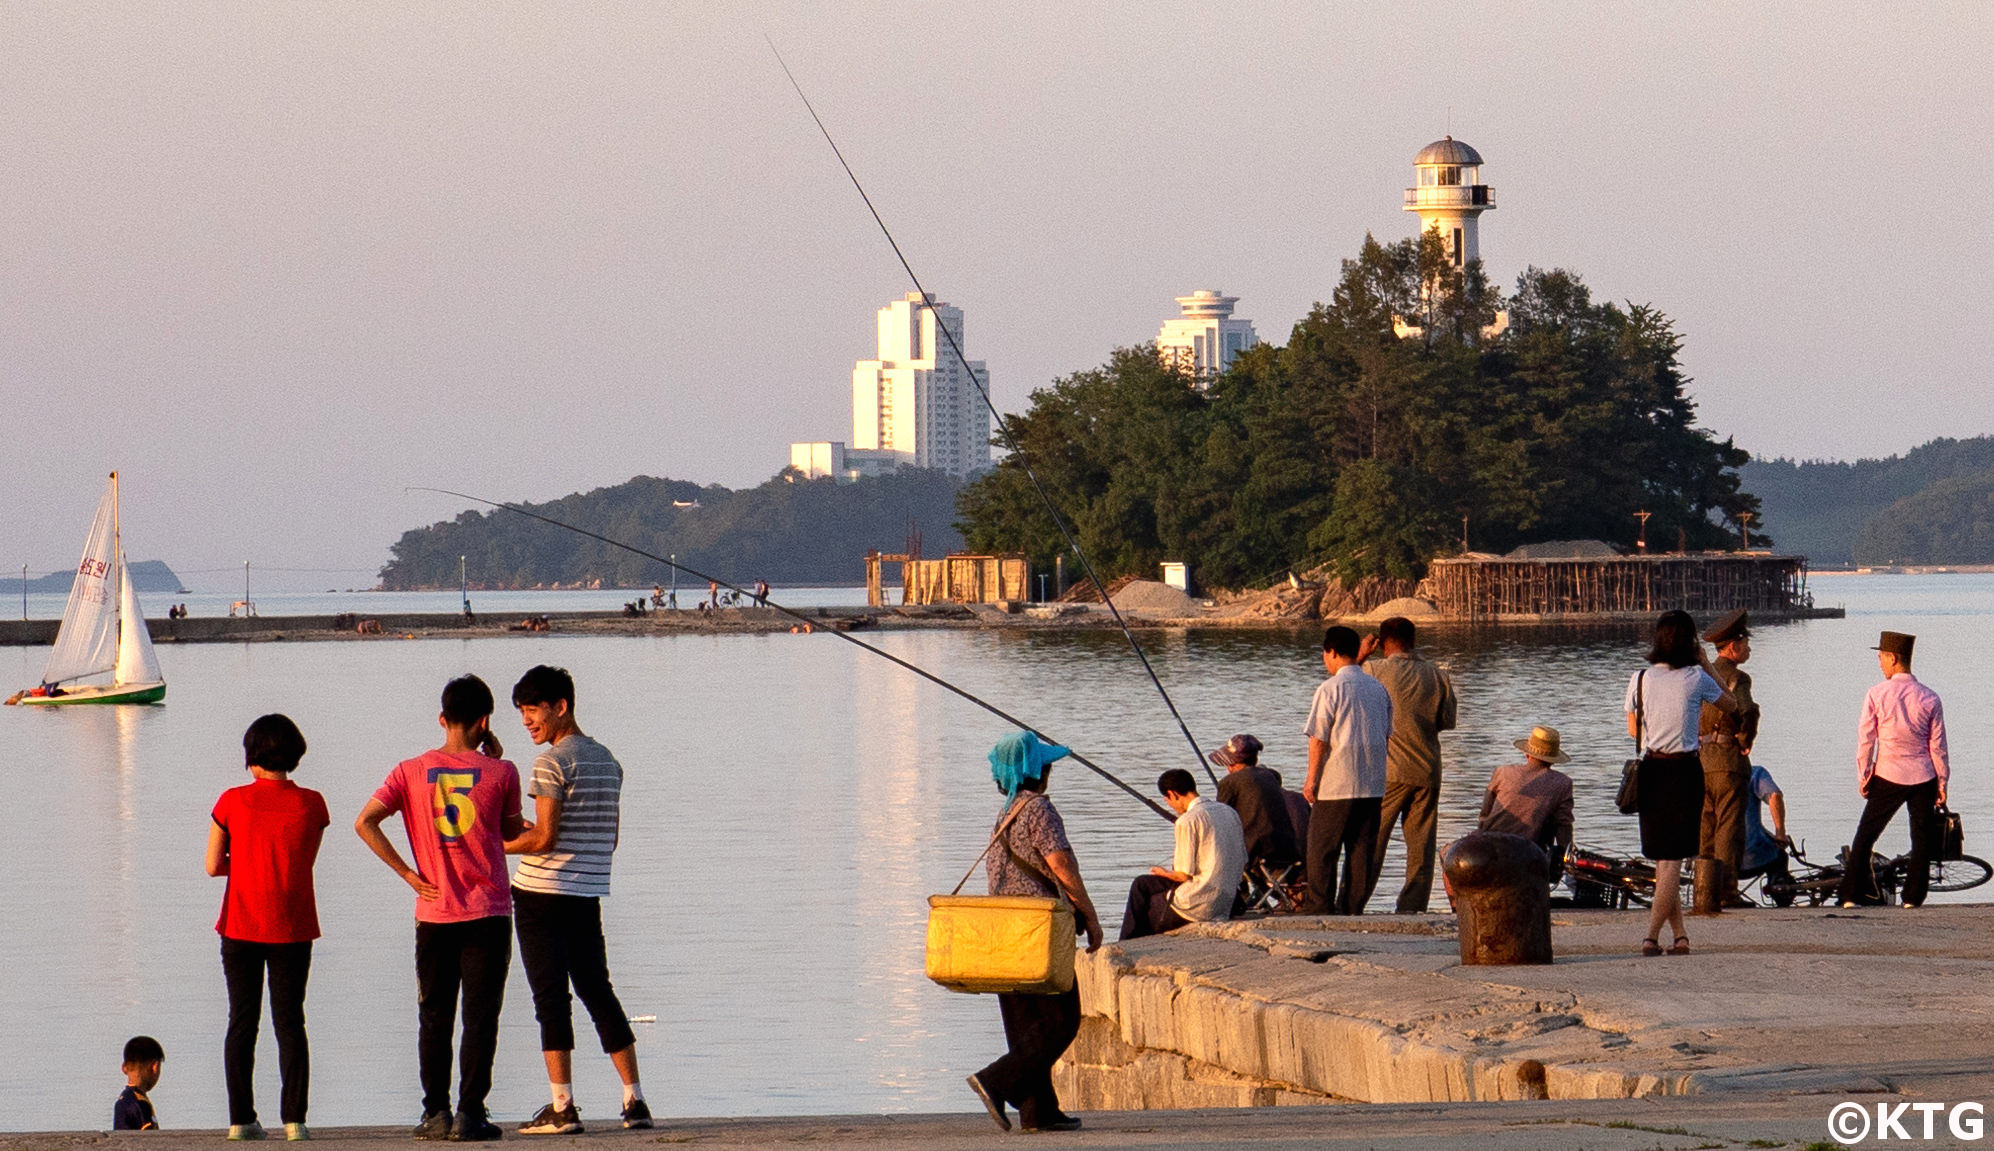 Port in Wonsan, North Korea (DPRK). Trip arranged by KTG Tours